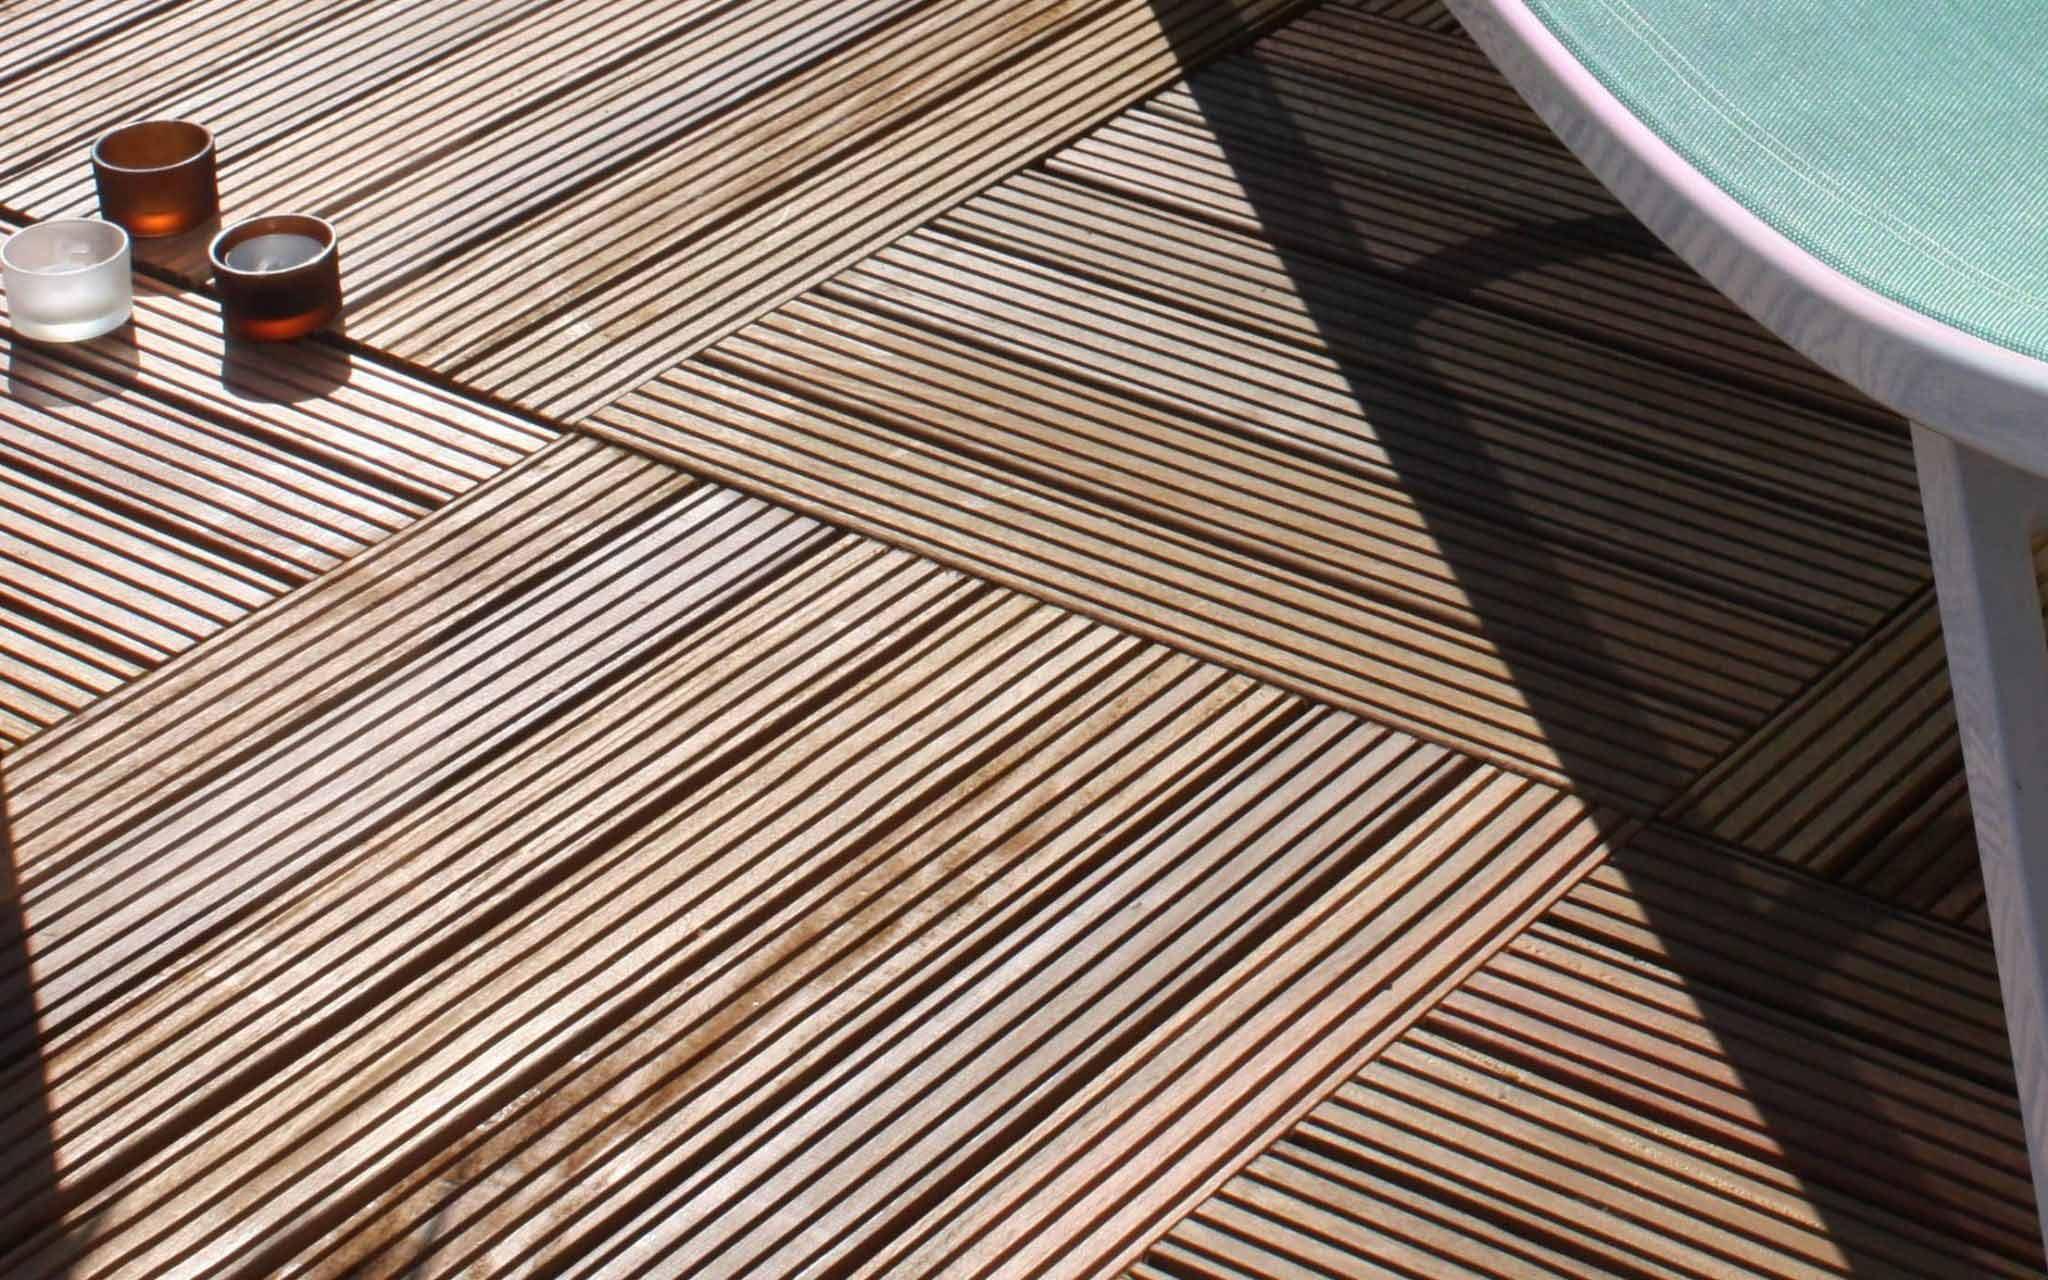 dalles caillebotis terrasse exotique bordeaux gironde angouleme charente arbao